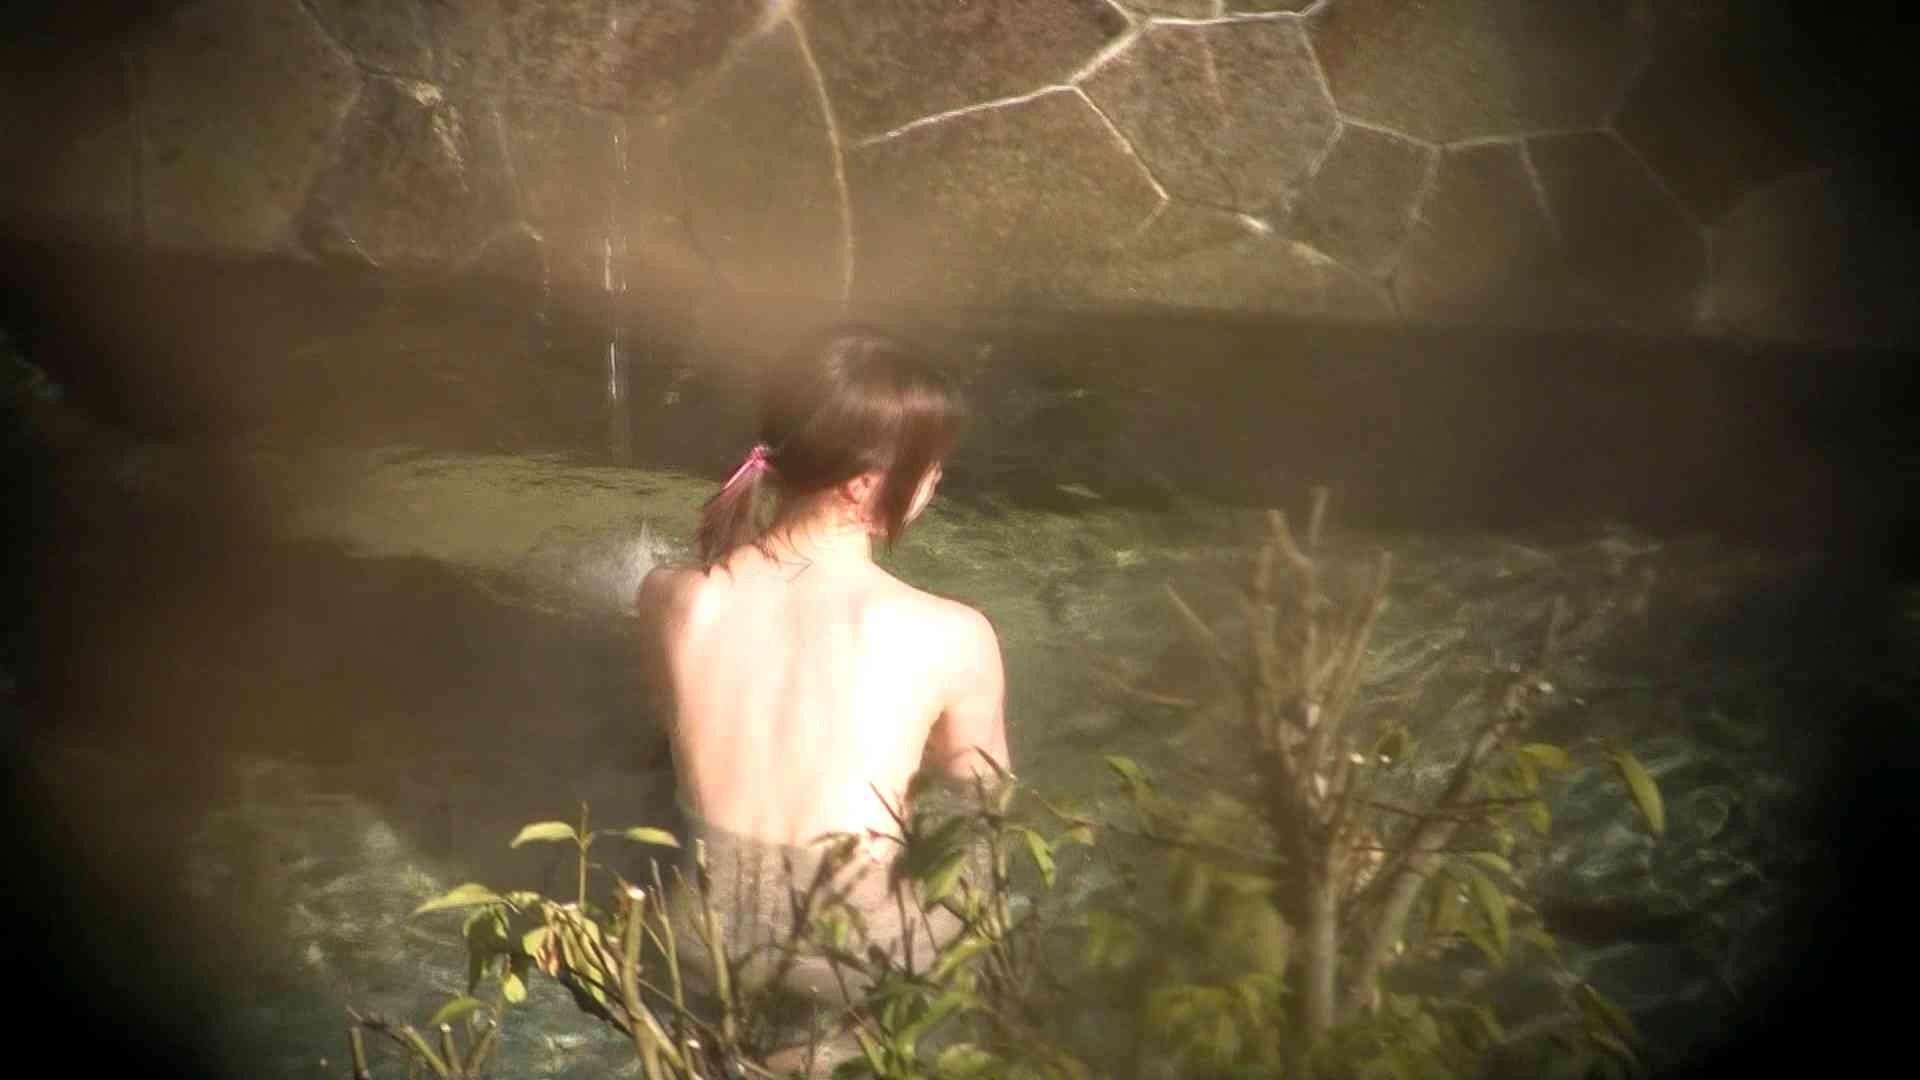 Aquaな露天風呂Vol.698 盗撮 | HなOL  86pic 73